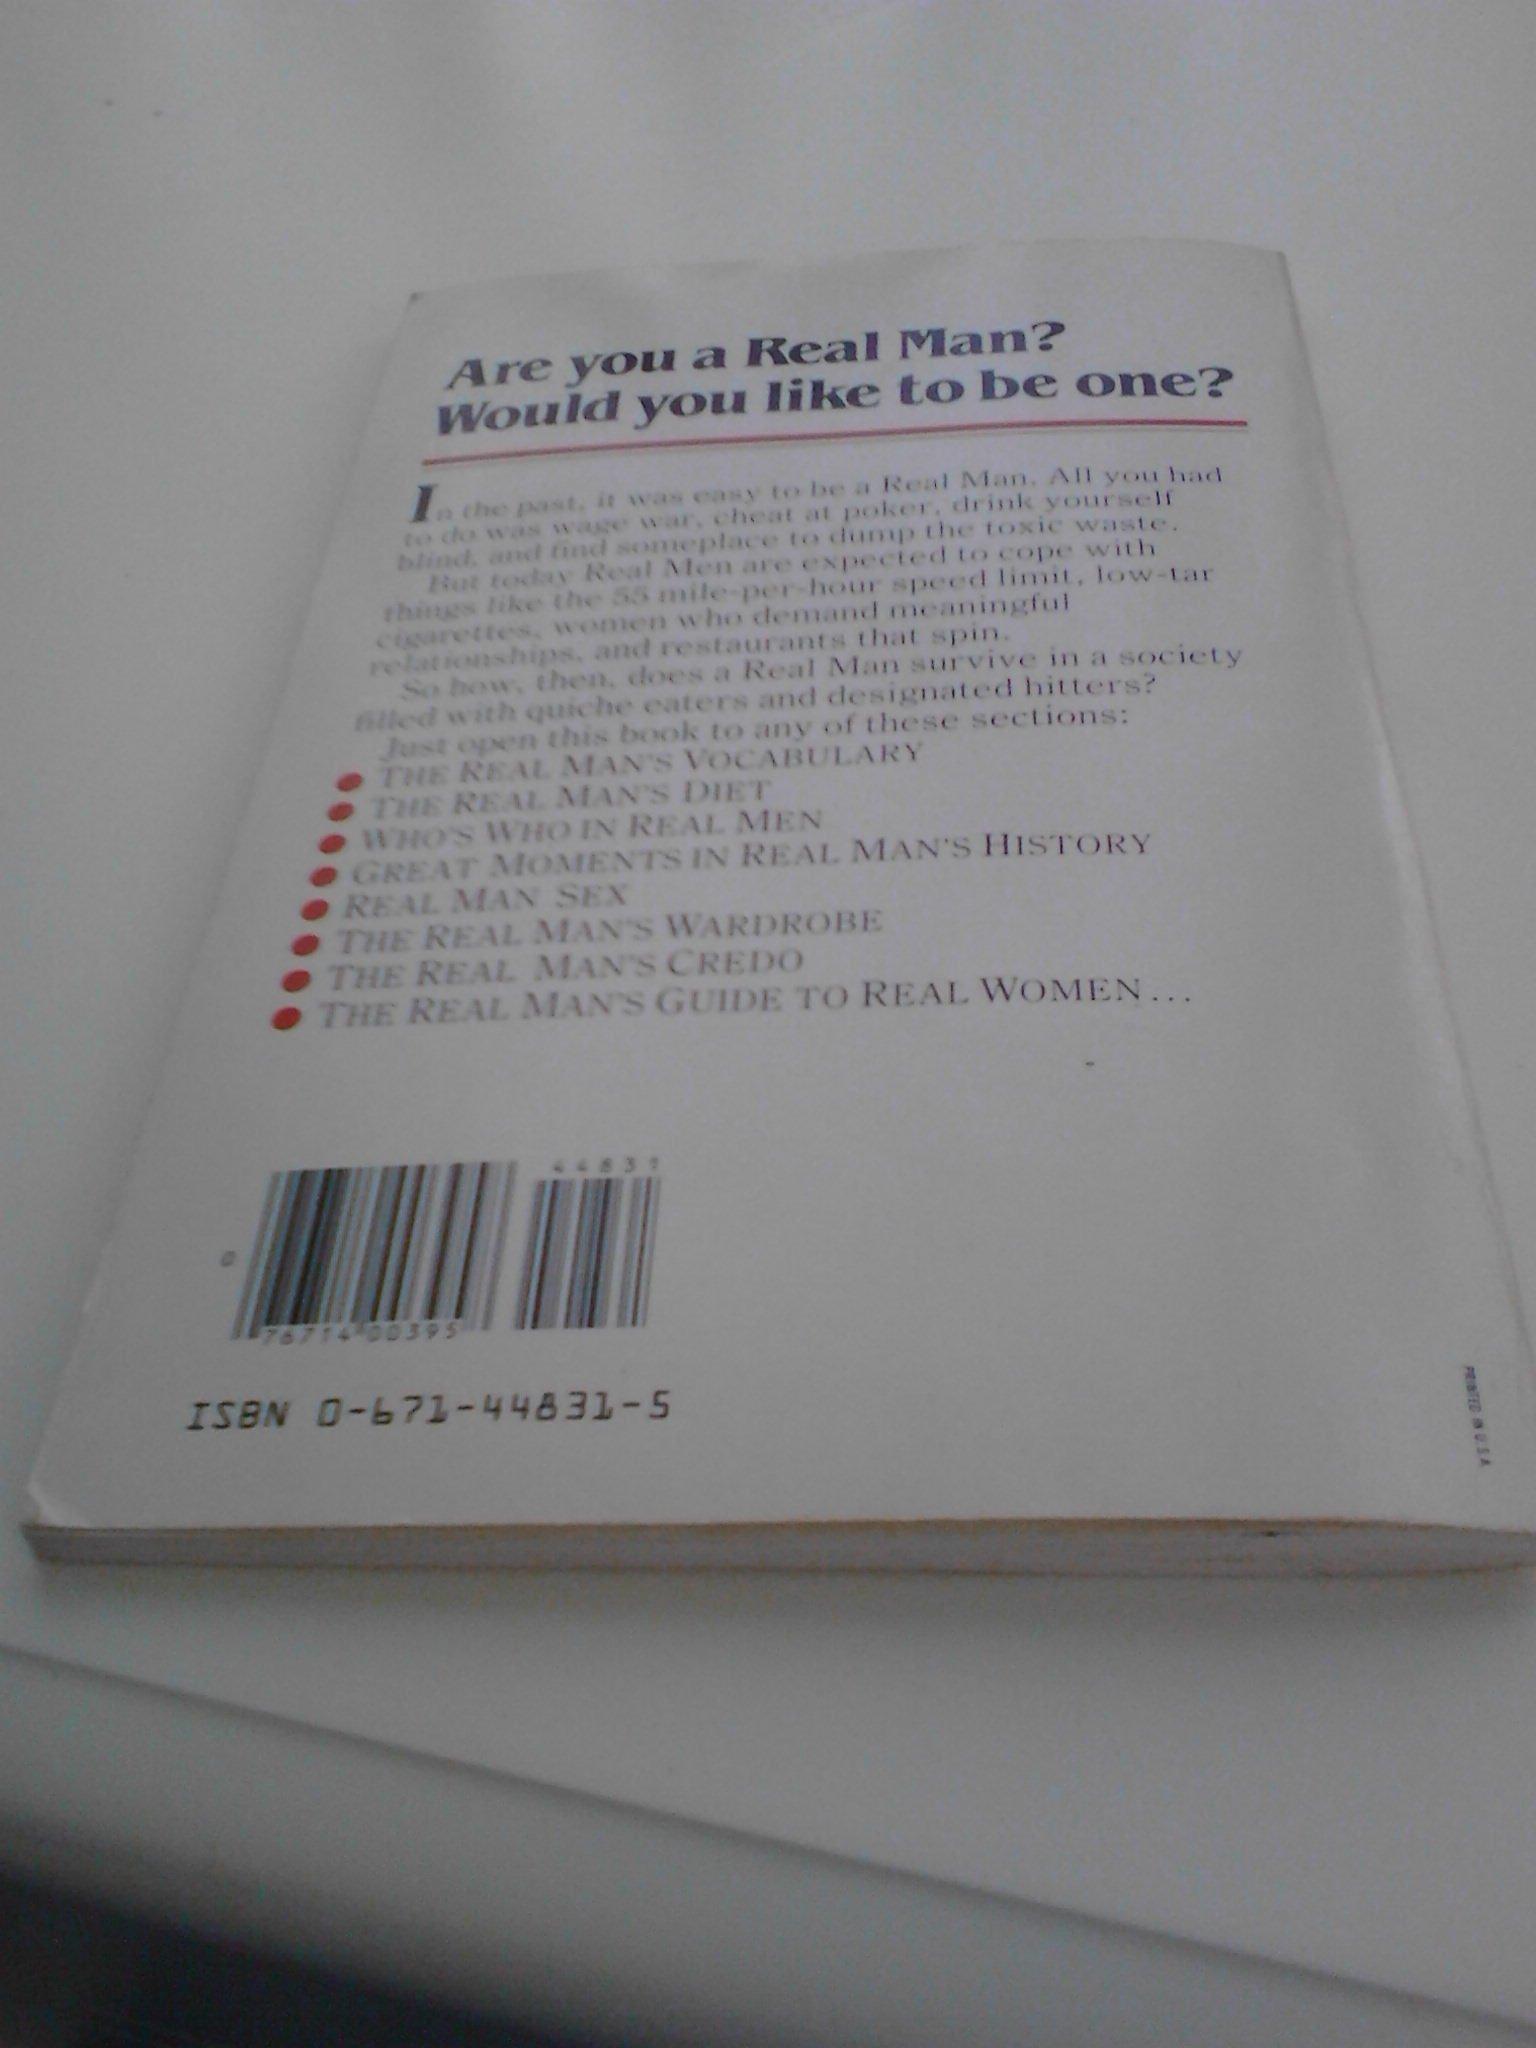 Real Men Dont Eat Quiche Bruce Feirstein Lee Lorenz Delta Tools Wiring Diagram 9780671448318 Books